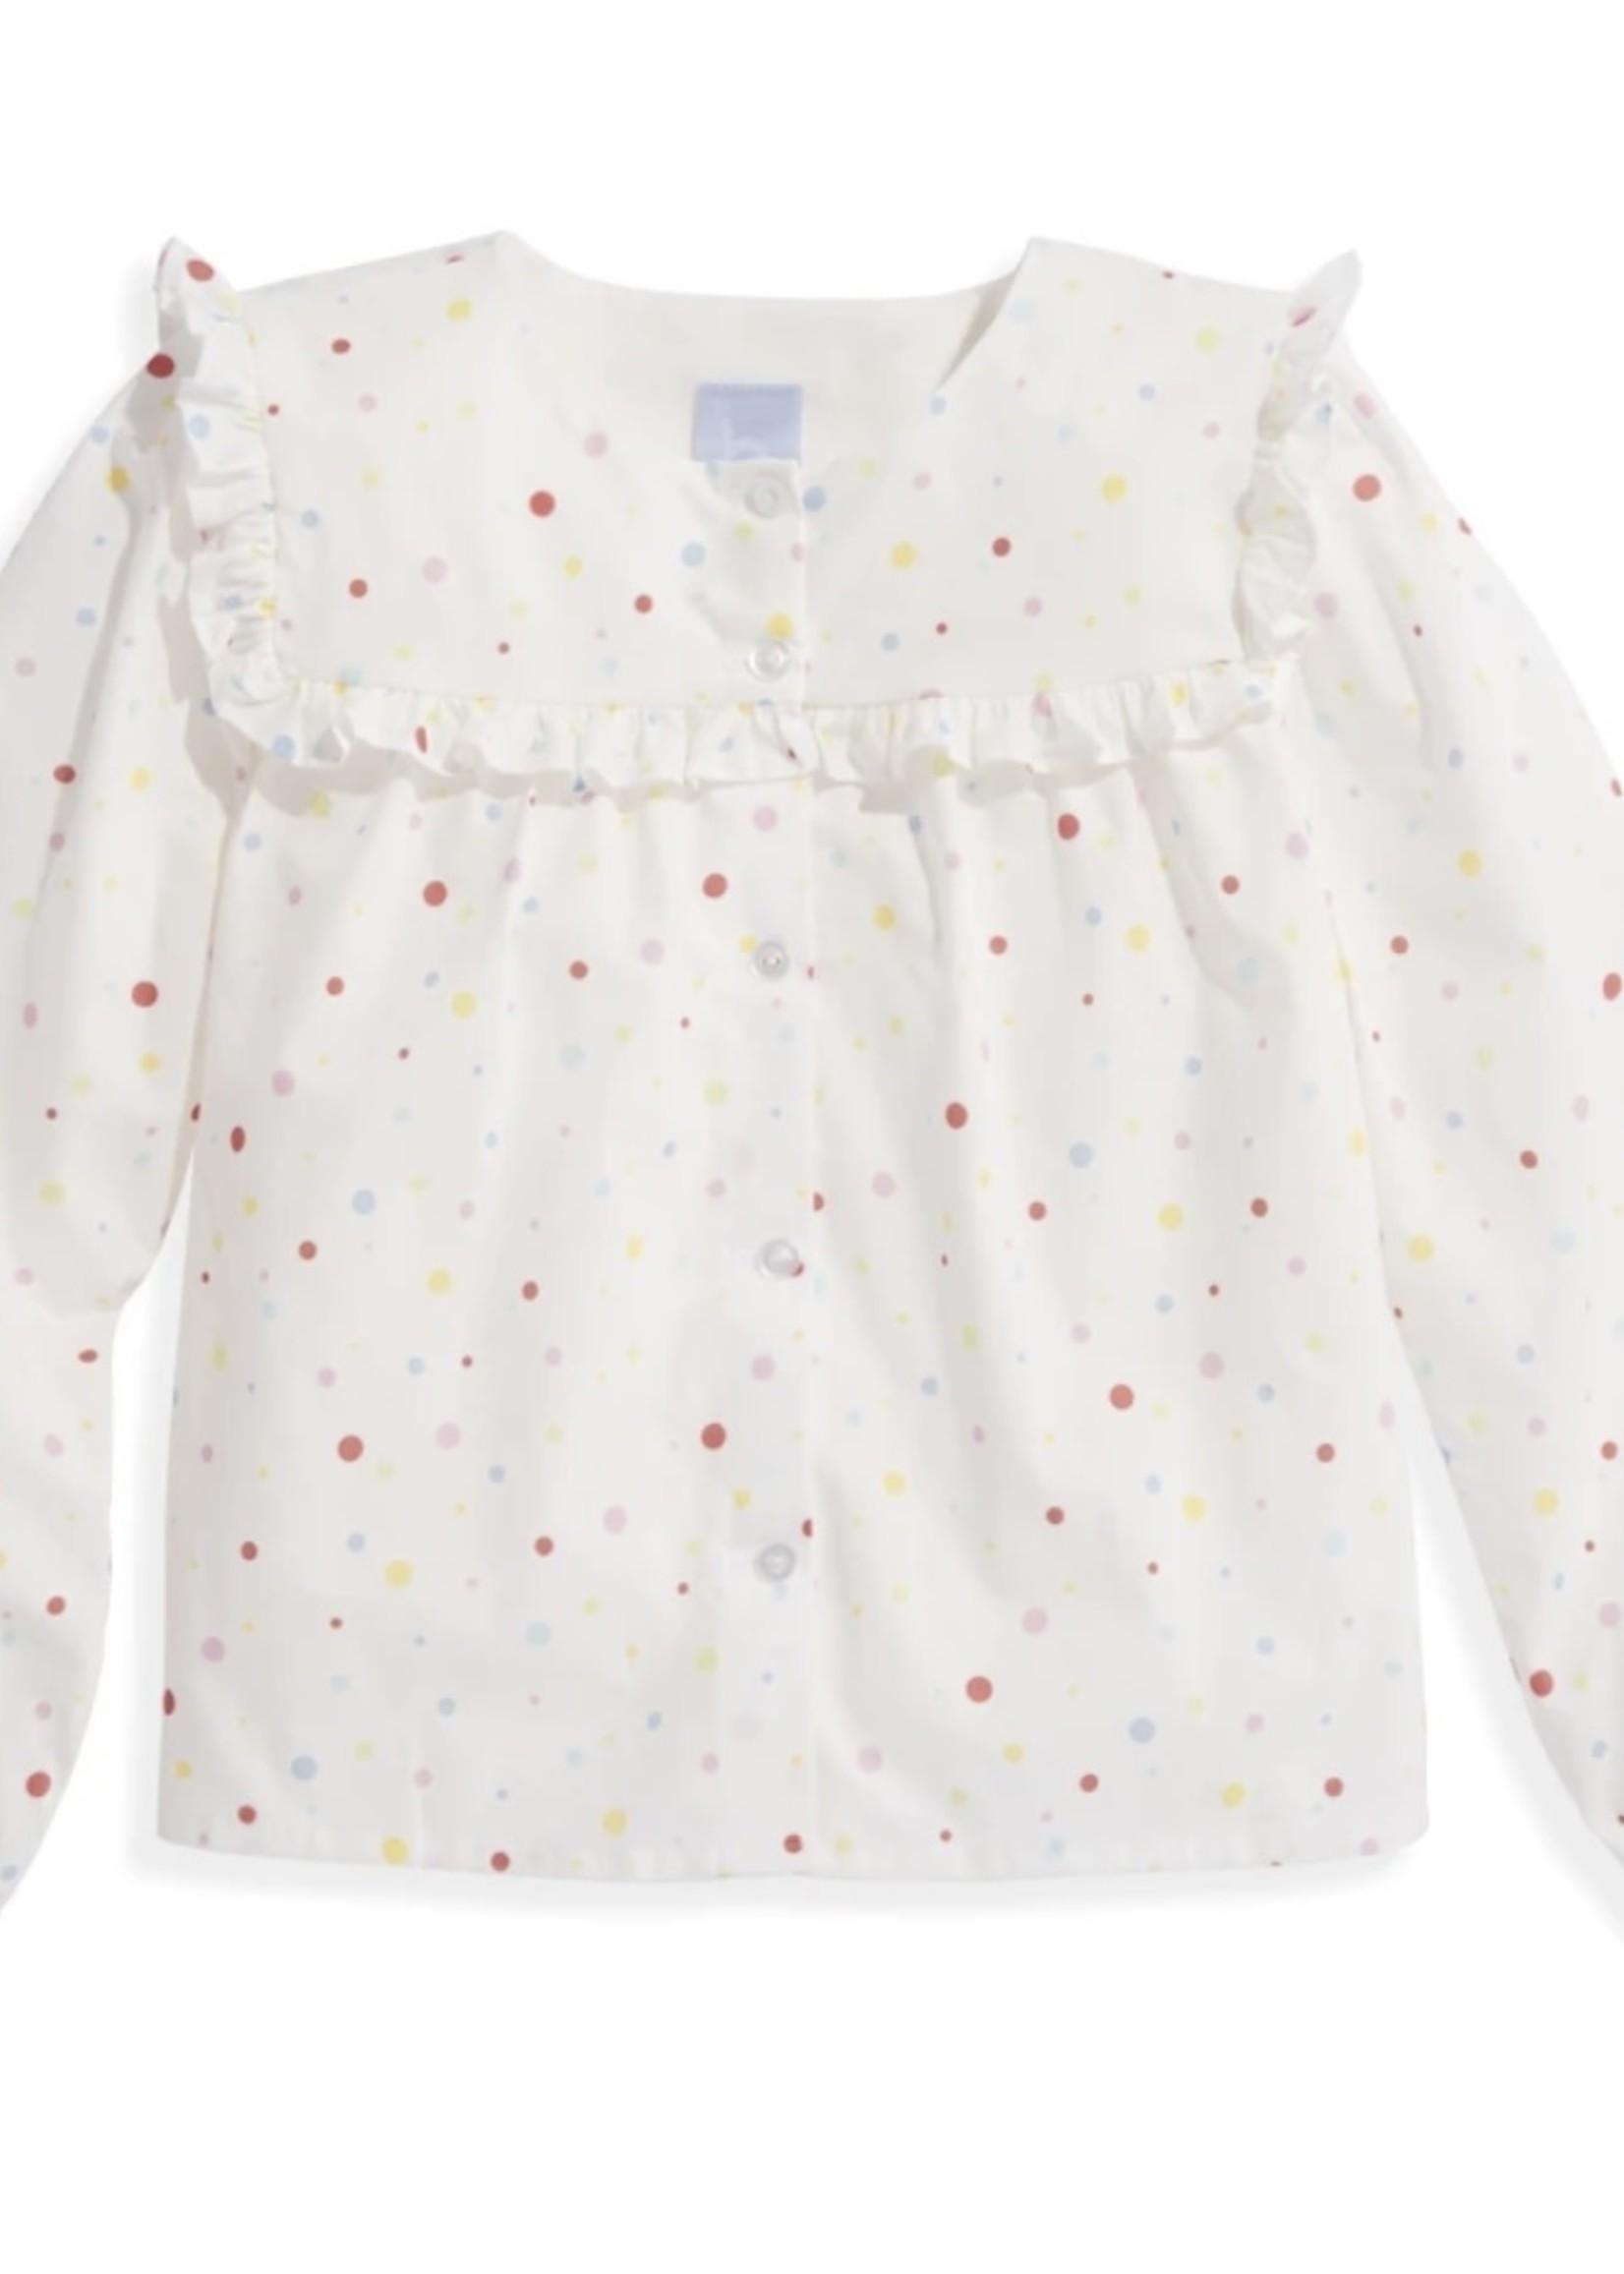 Meade Blouse - Confetti Dot